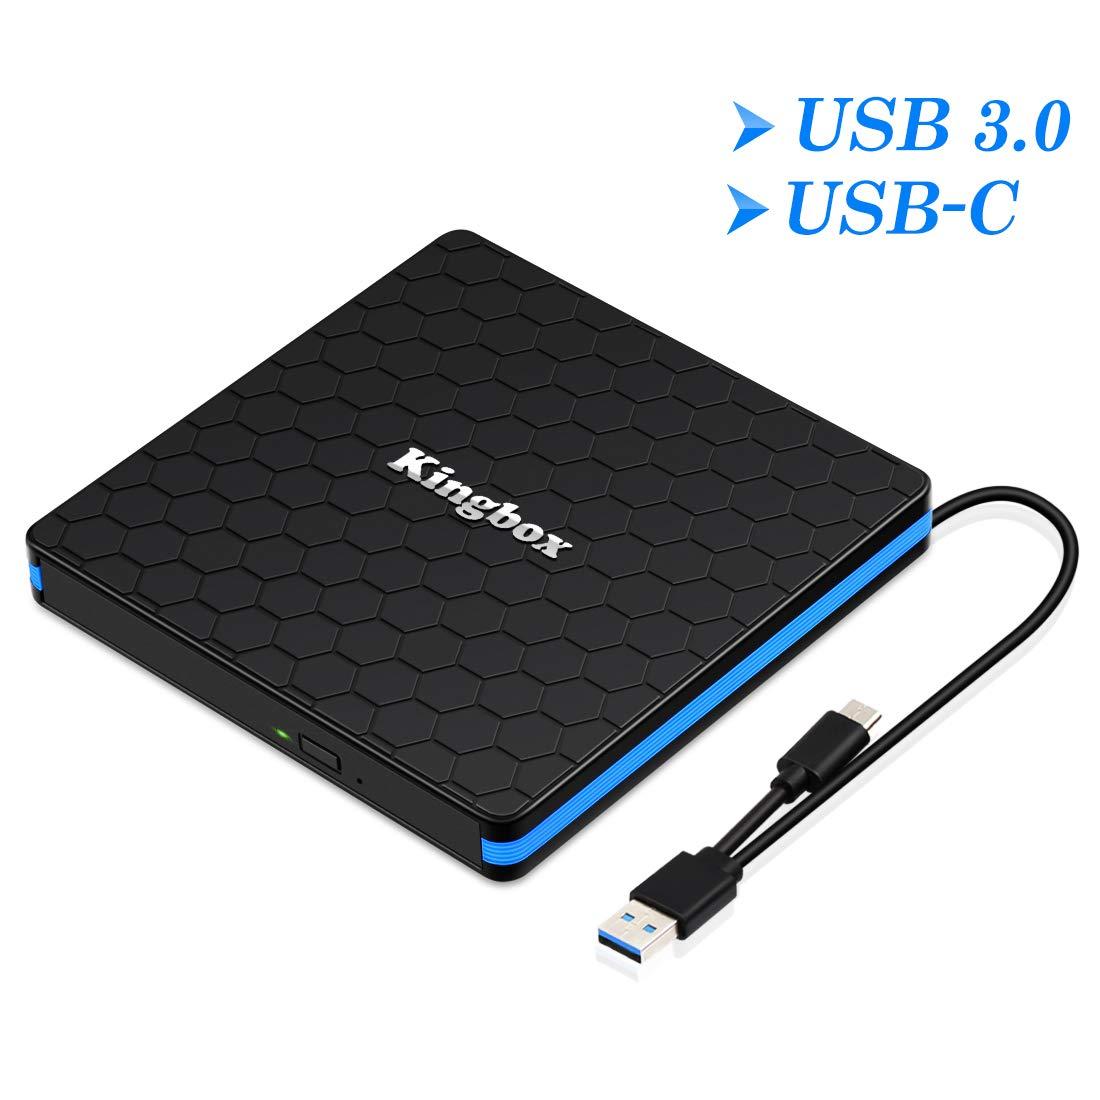 Kingbox External DVD Drive, Portable USB 3.0 Type-C CD/DVD Rewriter Burner Drive for Laptop Desktop PC Computer Windows Linux OS Apple Mac MacBook Pro Air iMac - High Speed Data Transfer - Black